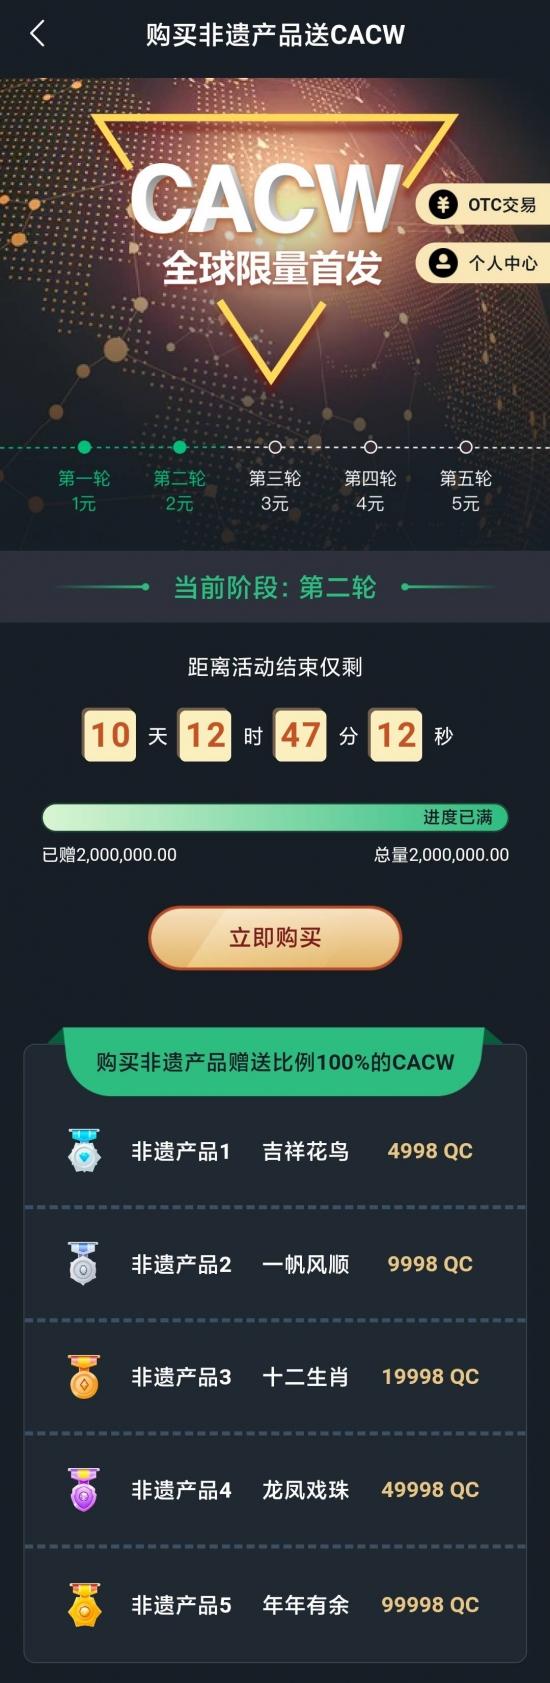 CACWorld购买非遗产品送CACW积分 第三轮即将开启